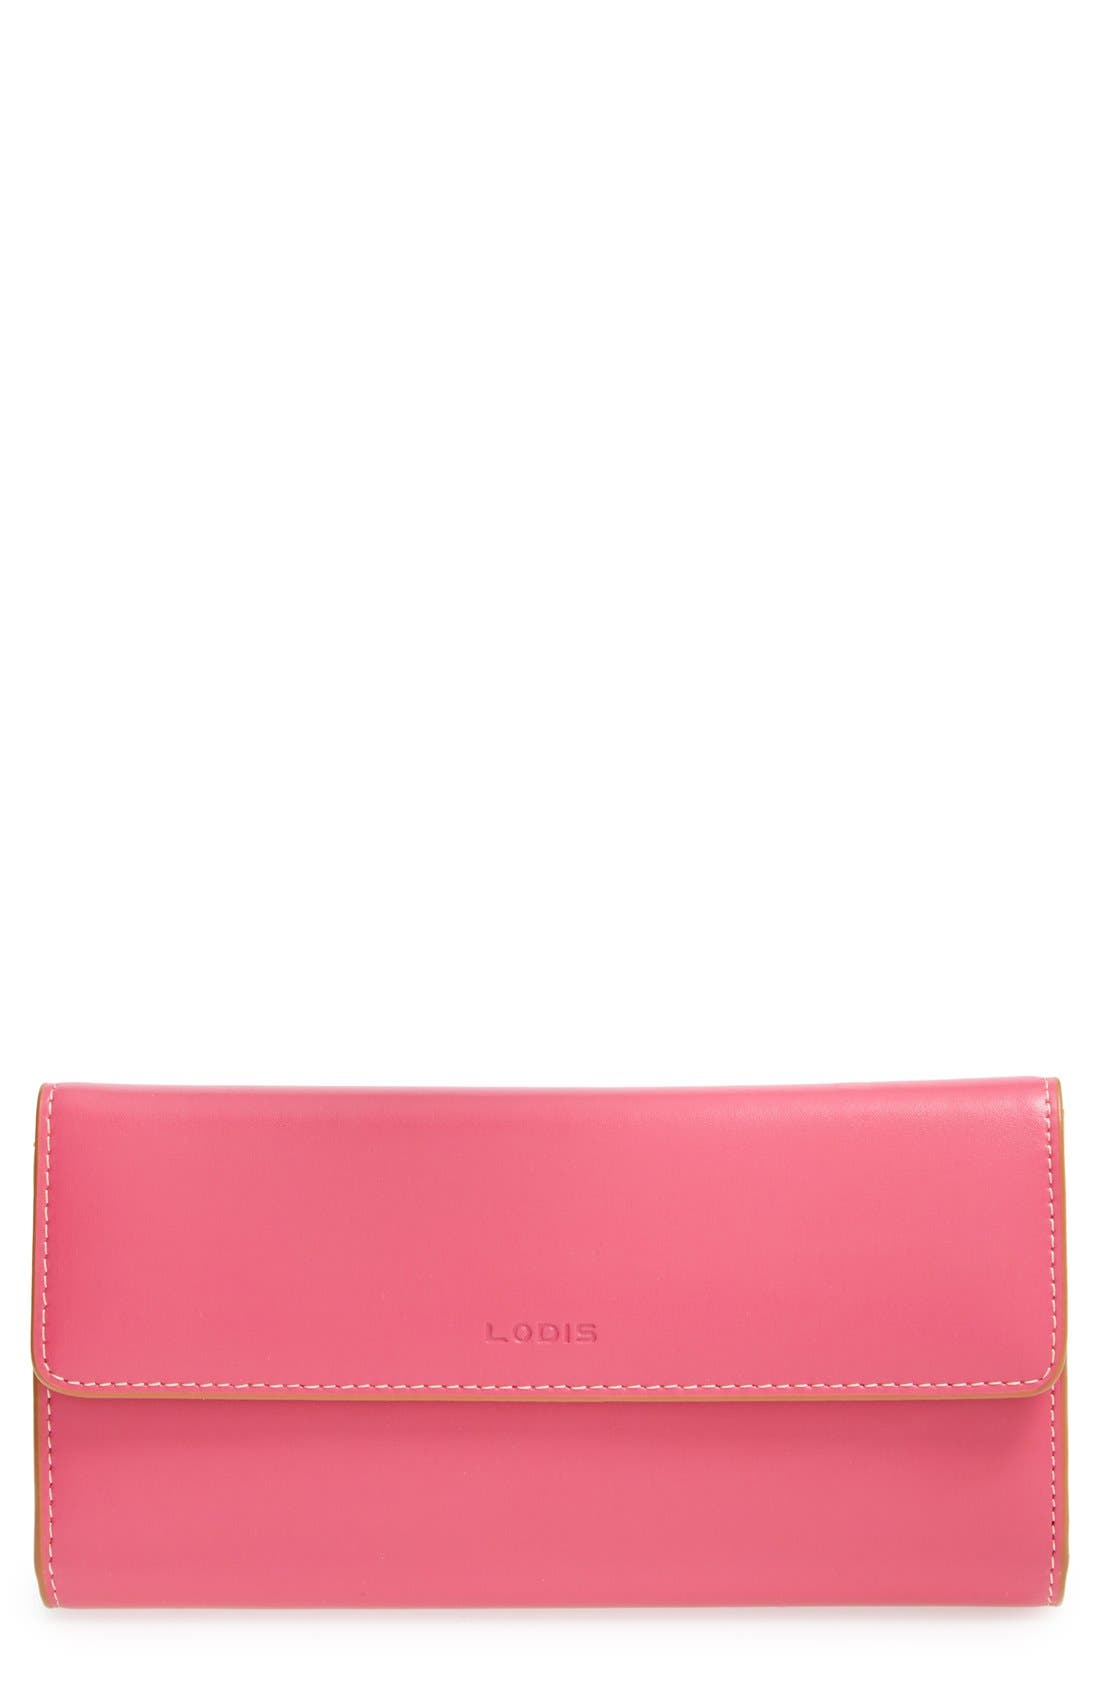 Main Image - Lodis 'Audrey' Checkbook Clutch Wallet